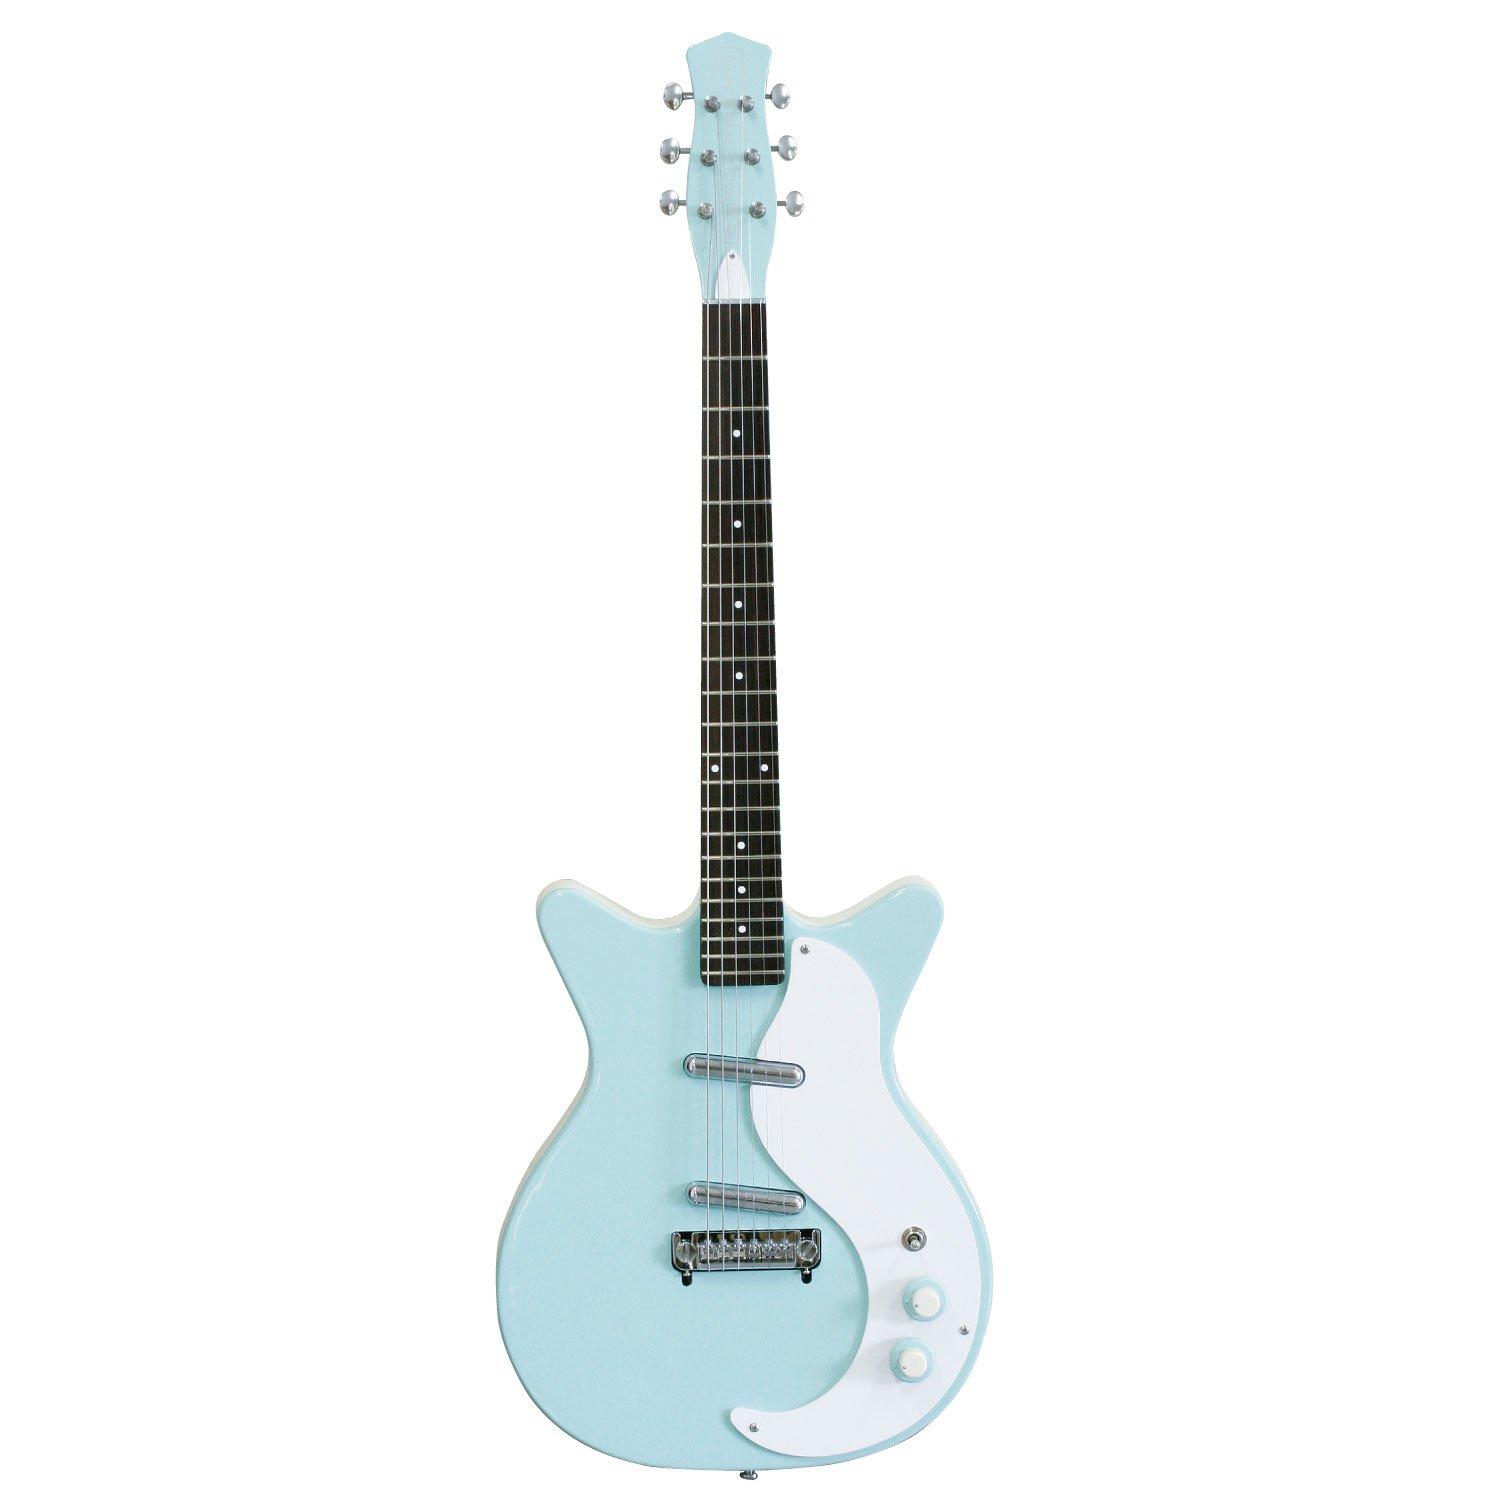 Cheap Danelectro 59M NOS Electric Guitar (Seafoam Green) Black Friday & Cyber Monday 2019